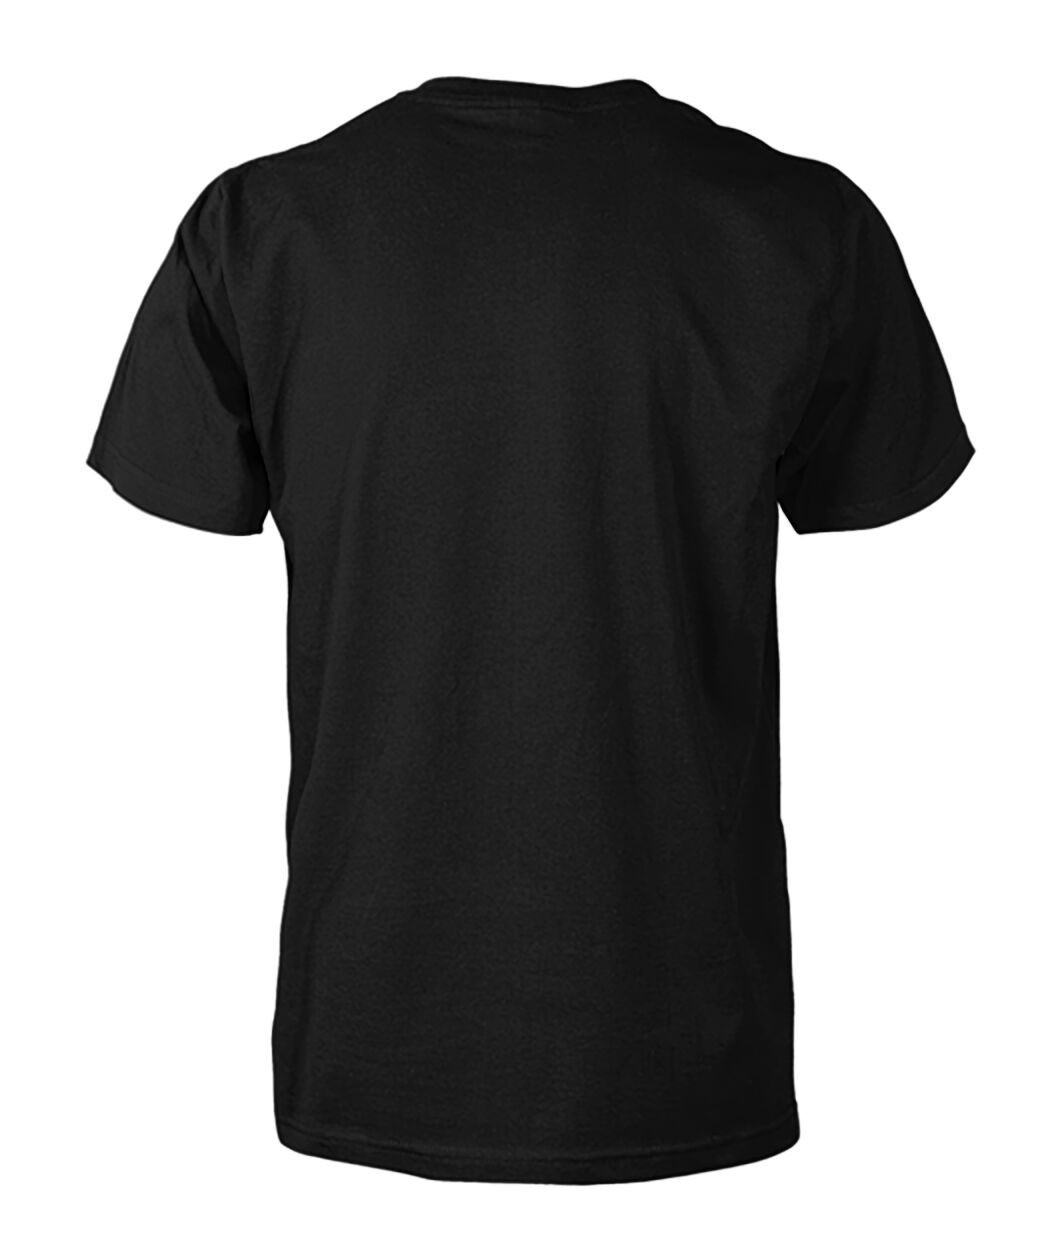 In Memory Of Dale Earnhardt Shirt 2